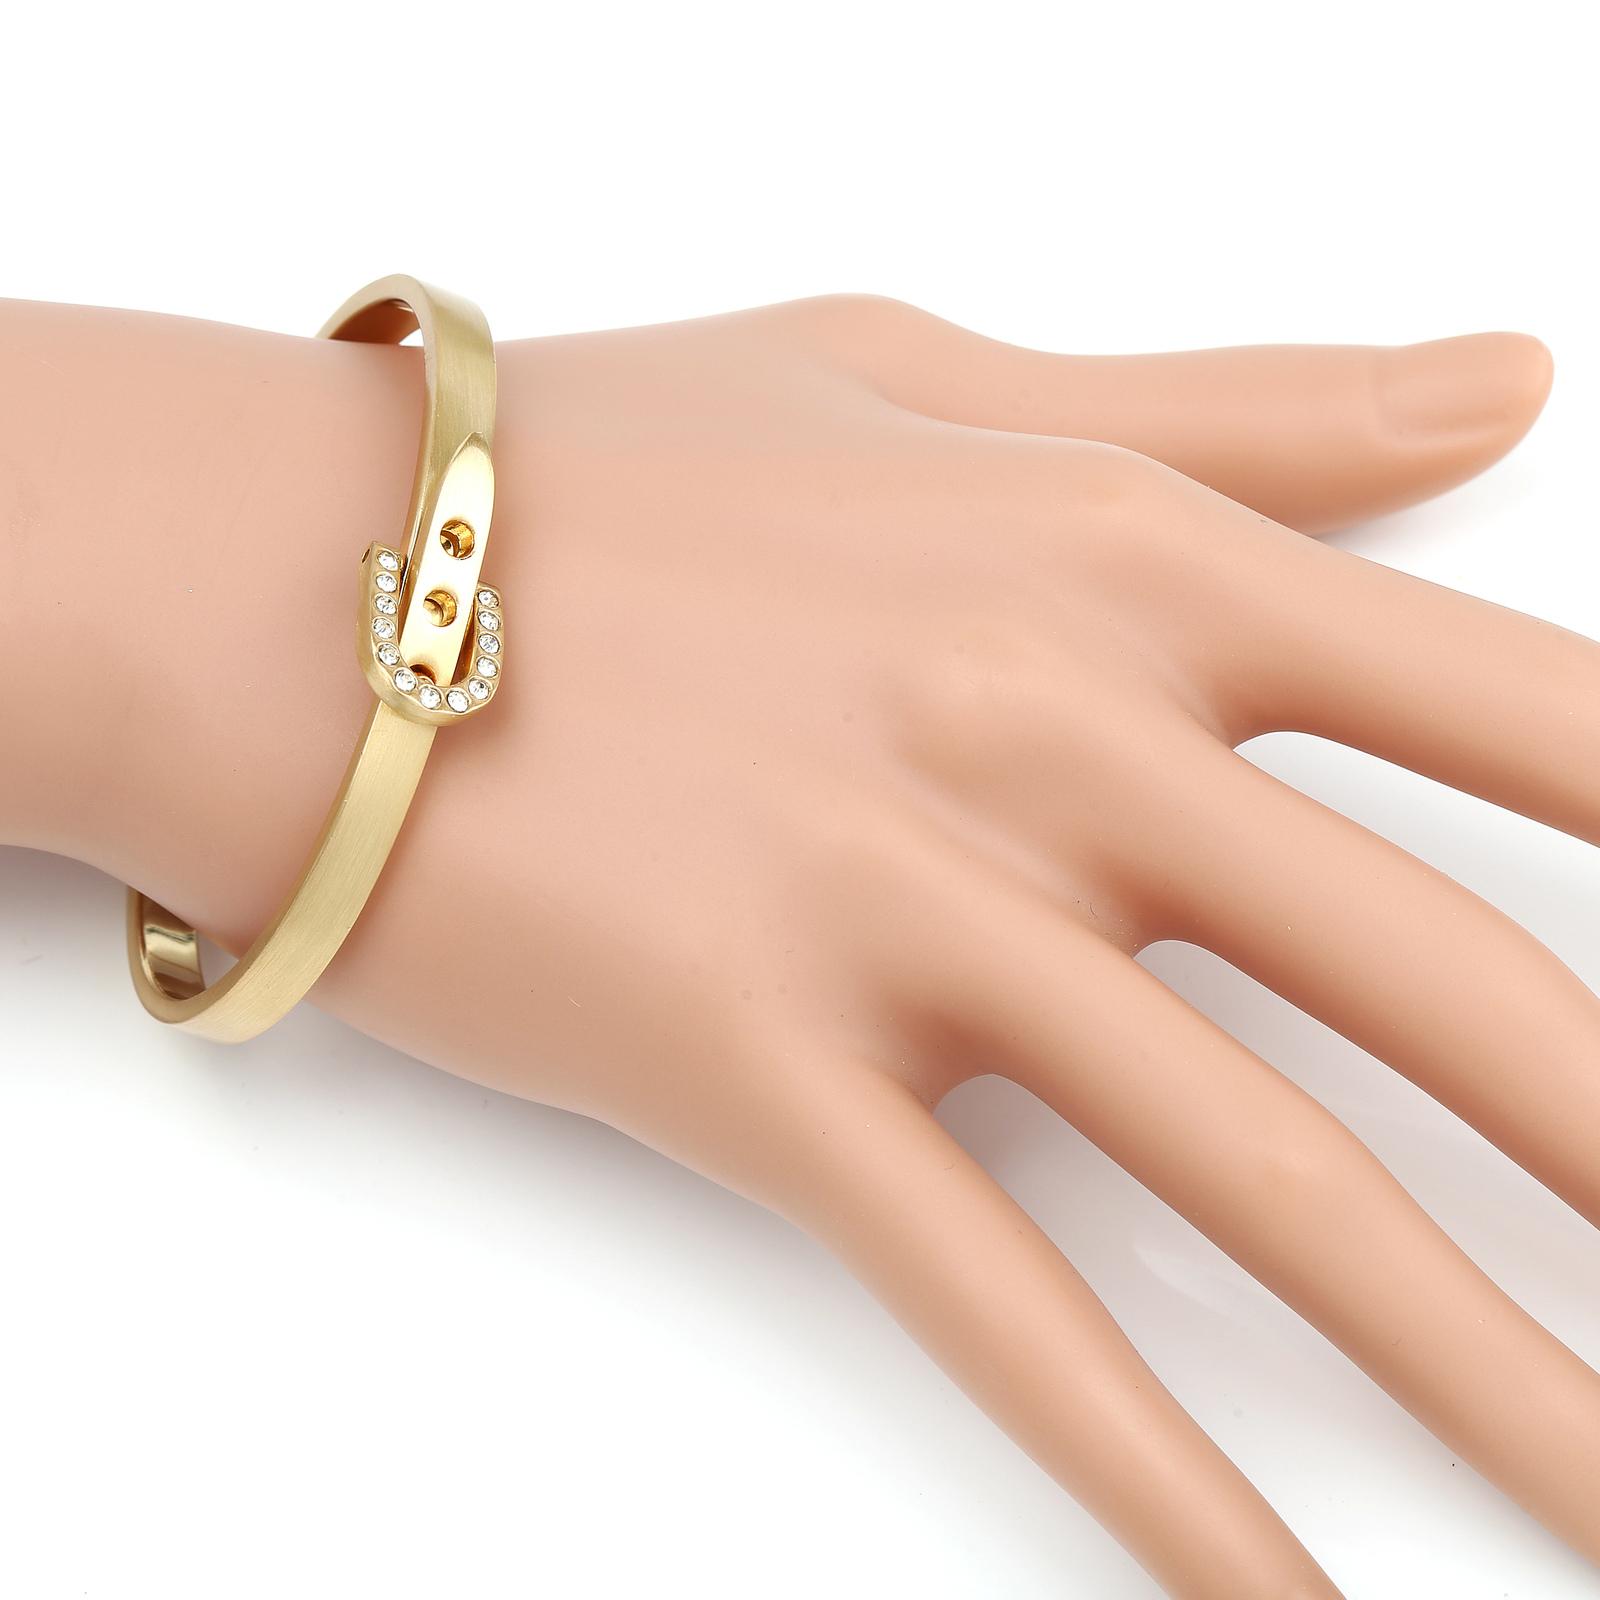 UE-Designer Gold Tone Bangle Bracelet, Buckle Clasp & Swarovski Style Crystals